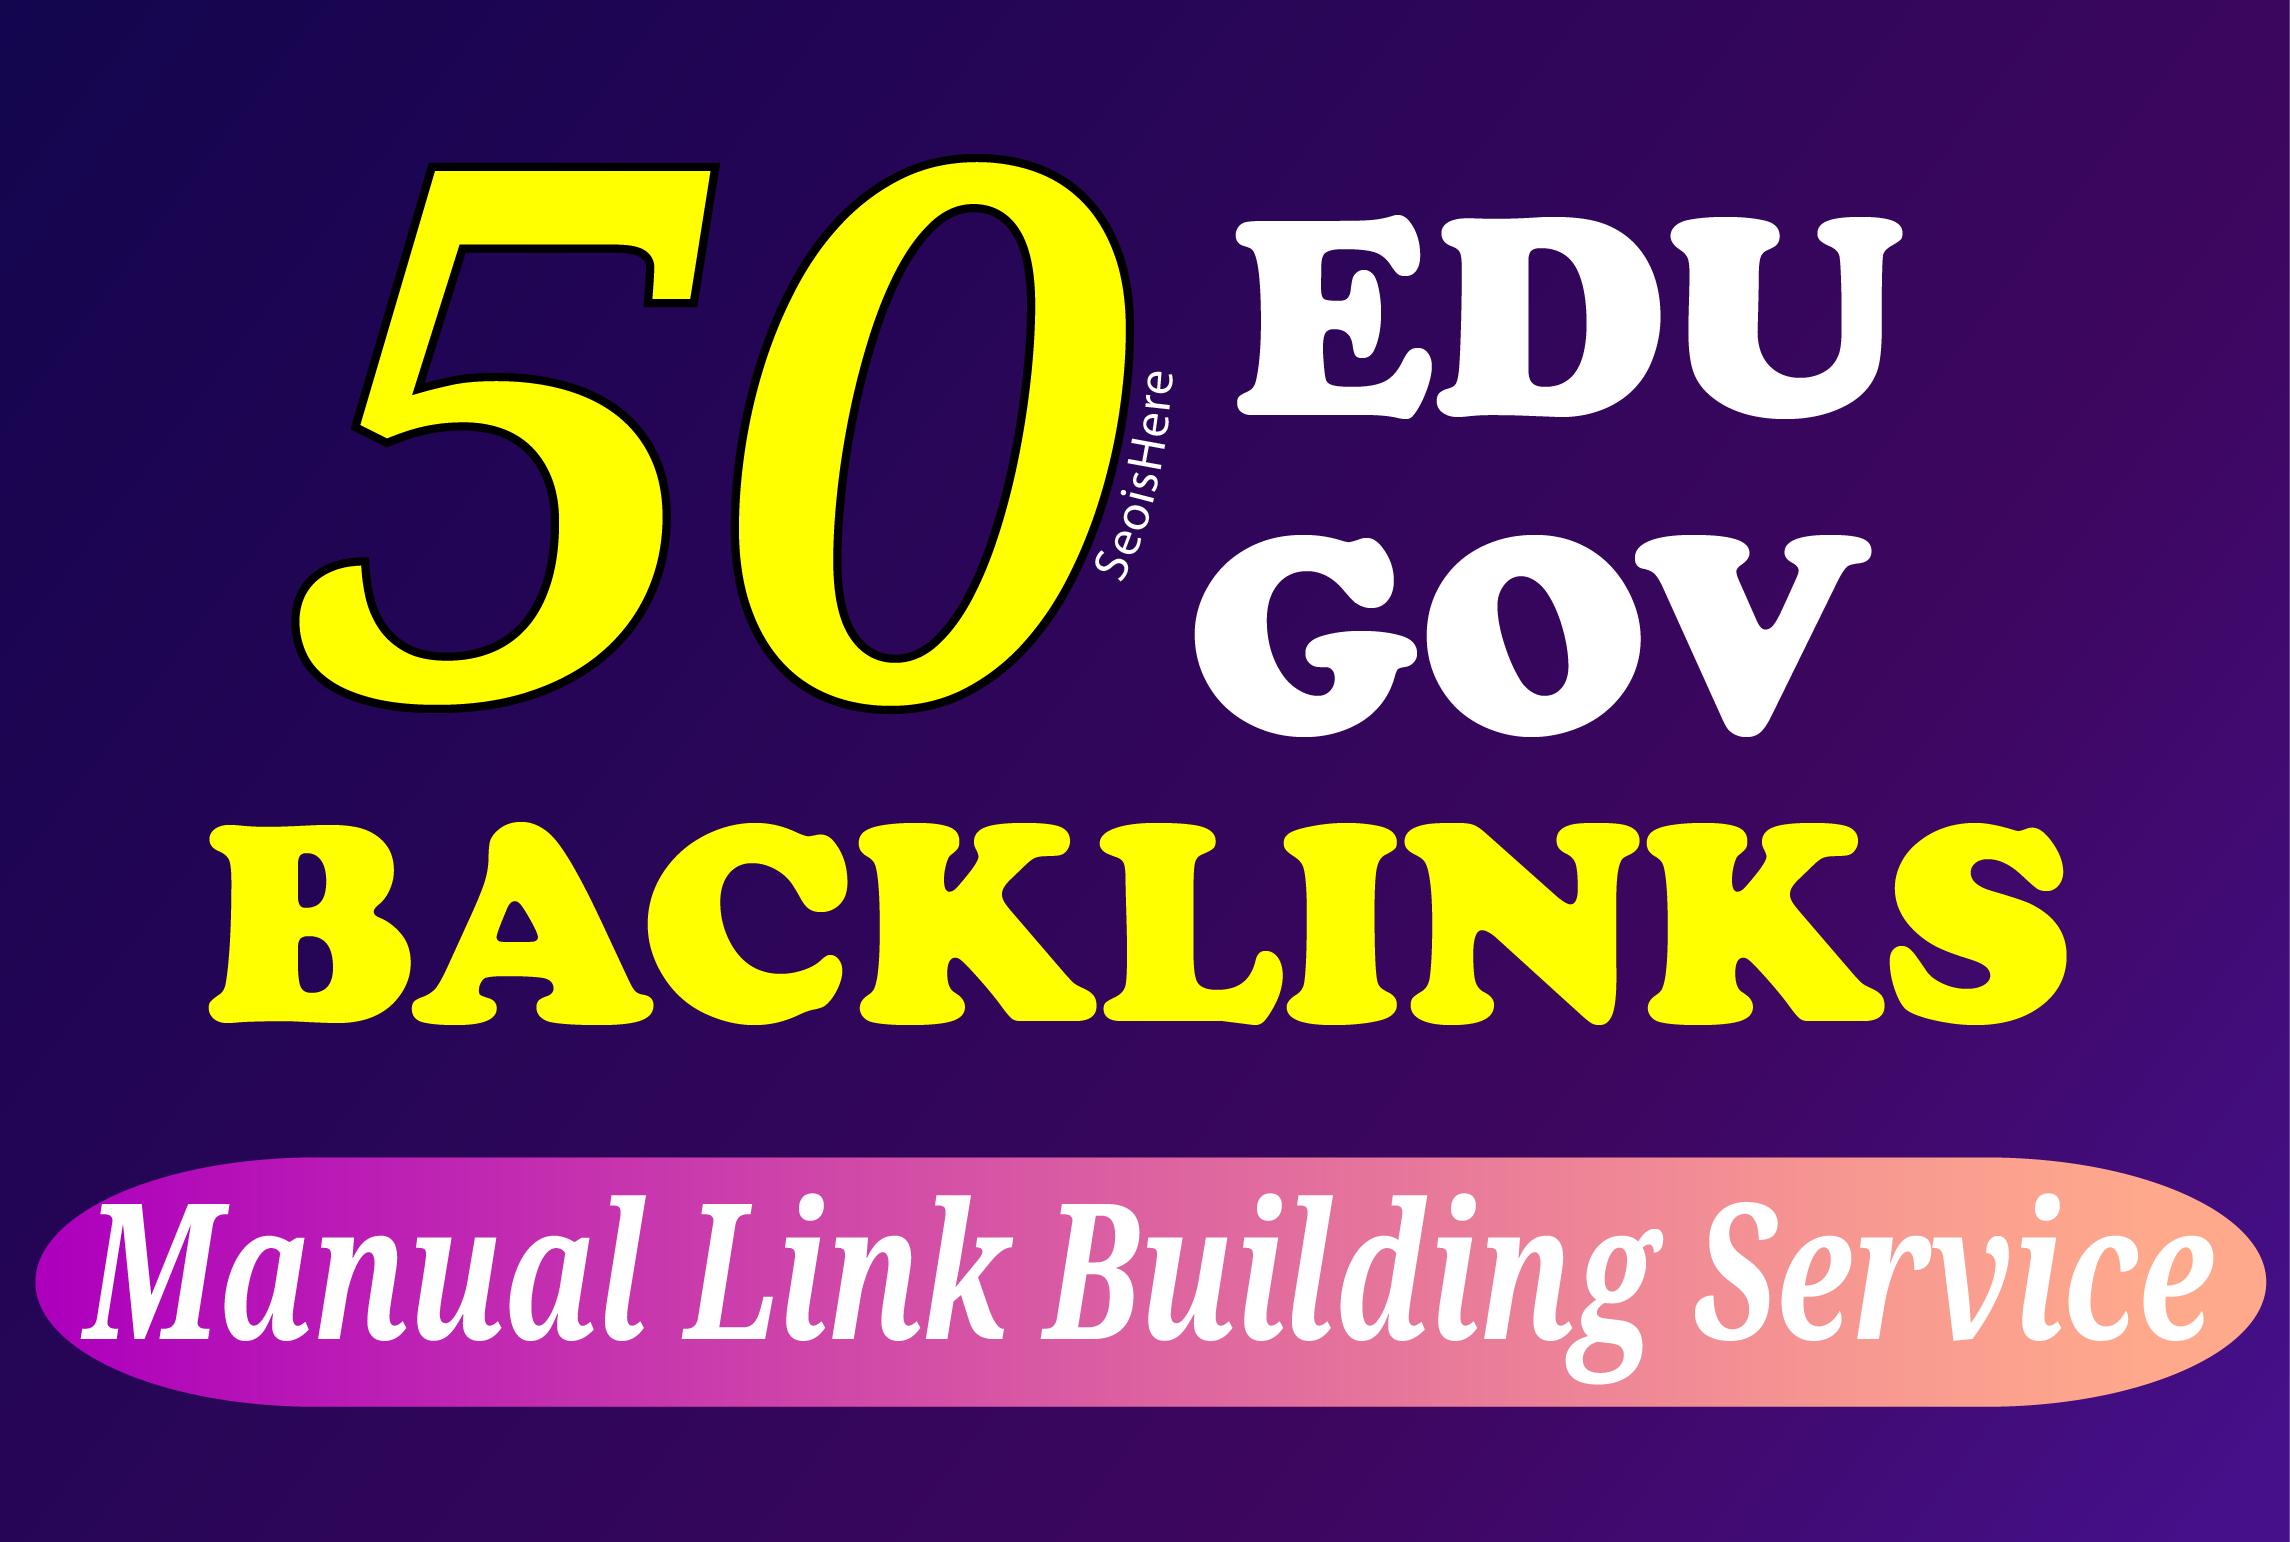 I will manually build 30 DA90+ and 20 Edu/Gov backlinks white hat SEO link building